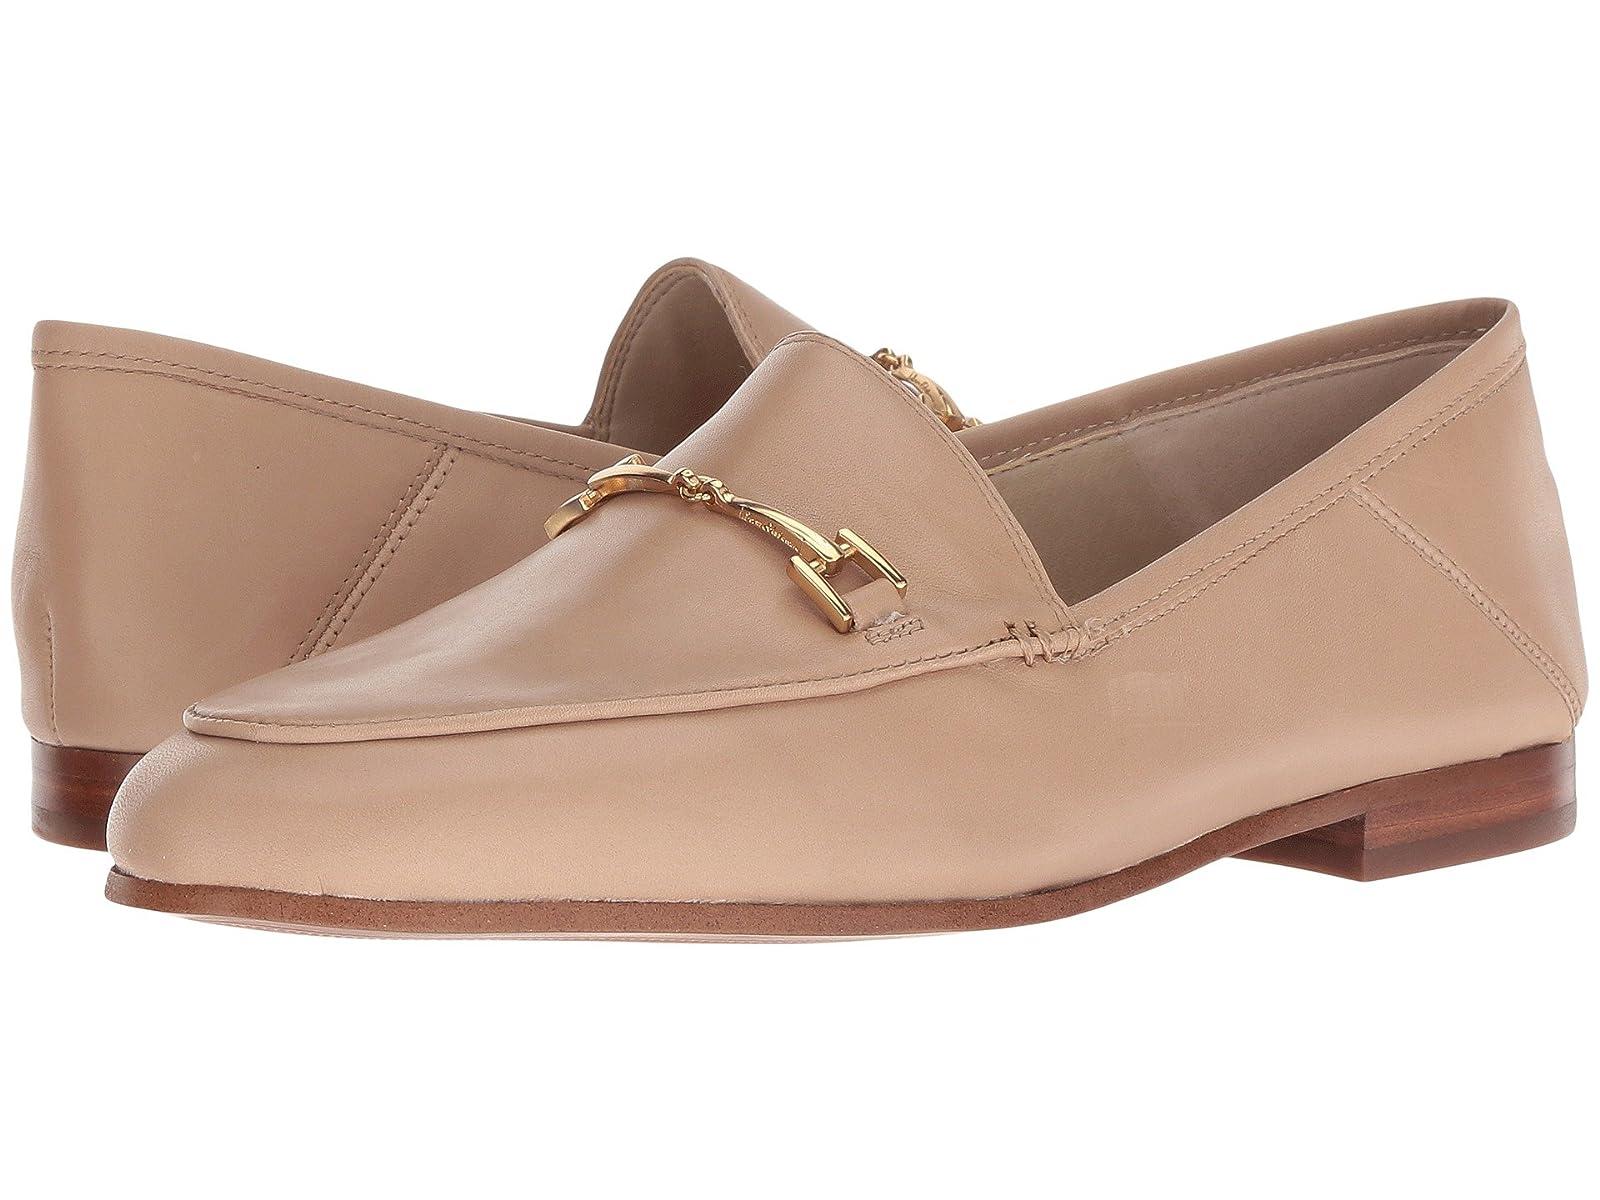 Sam Edelman LoraineAtmospheric grades have affordable shoes